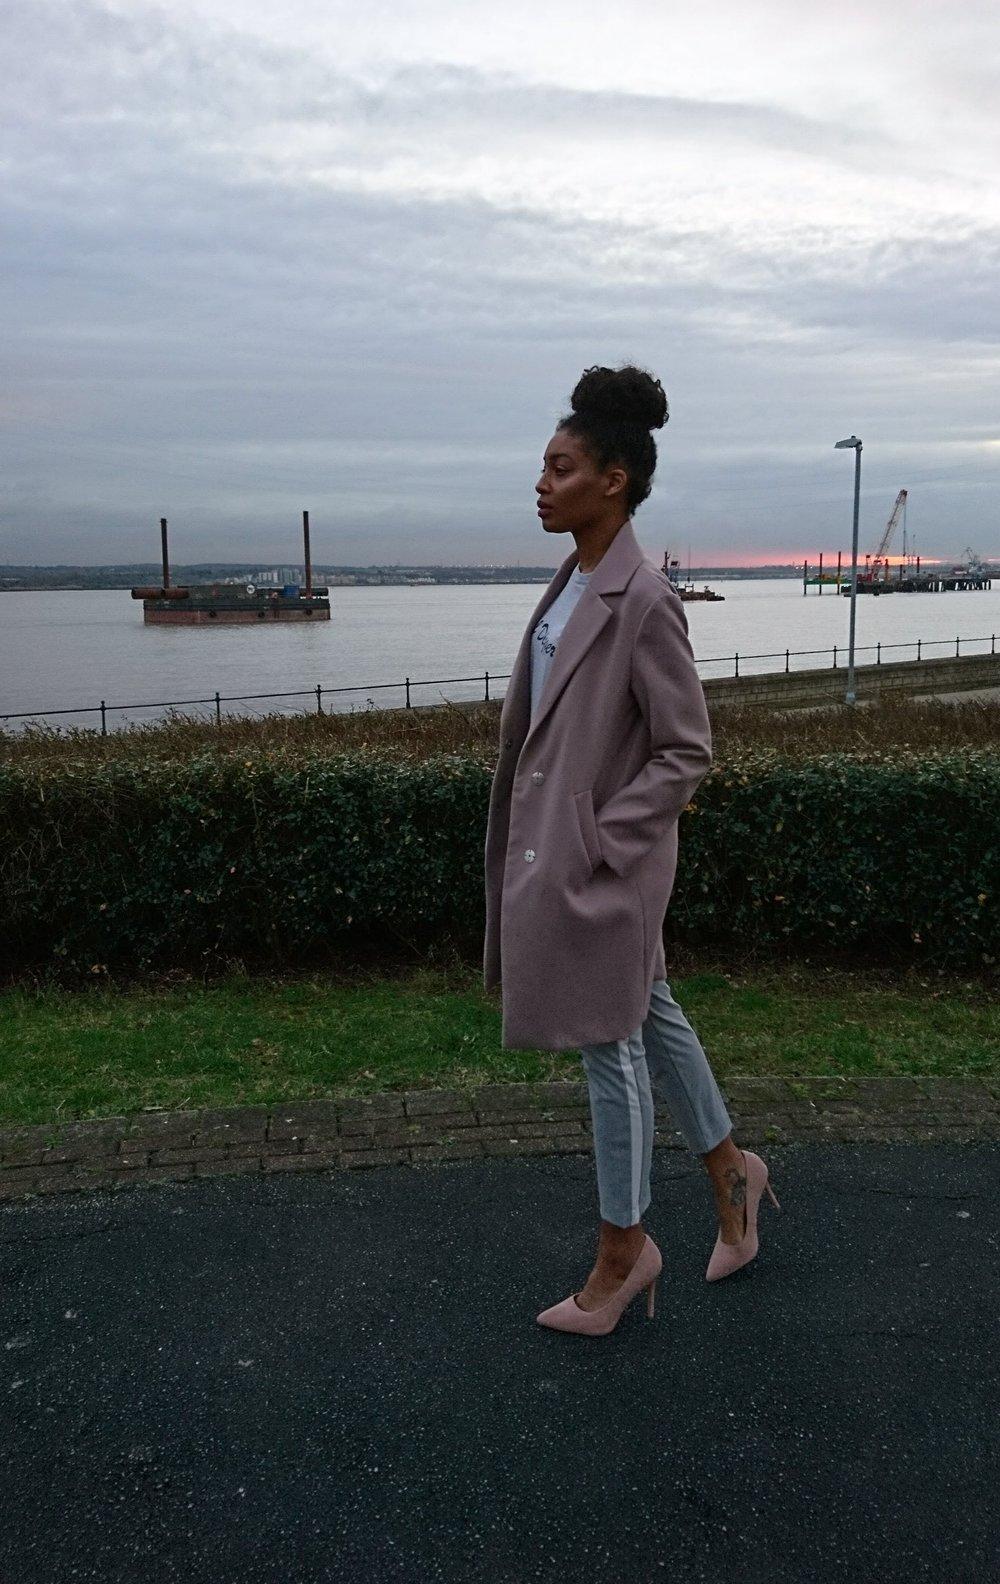 Goal Digger T-shirt - Topshop    Lilac coat, blush shoes and black bag - New Look    Grey trousers - Zara